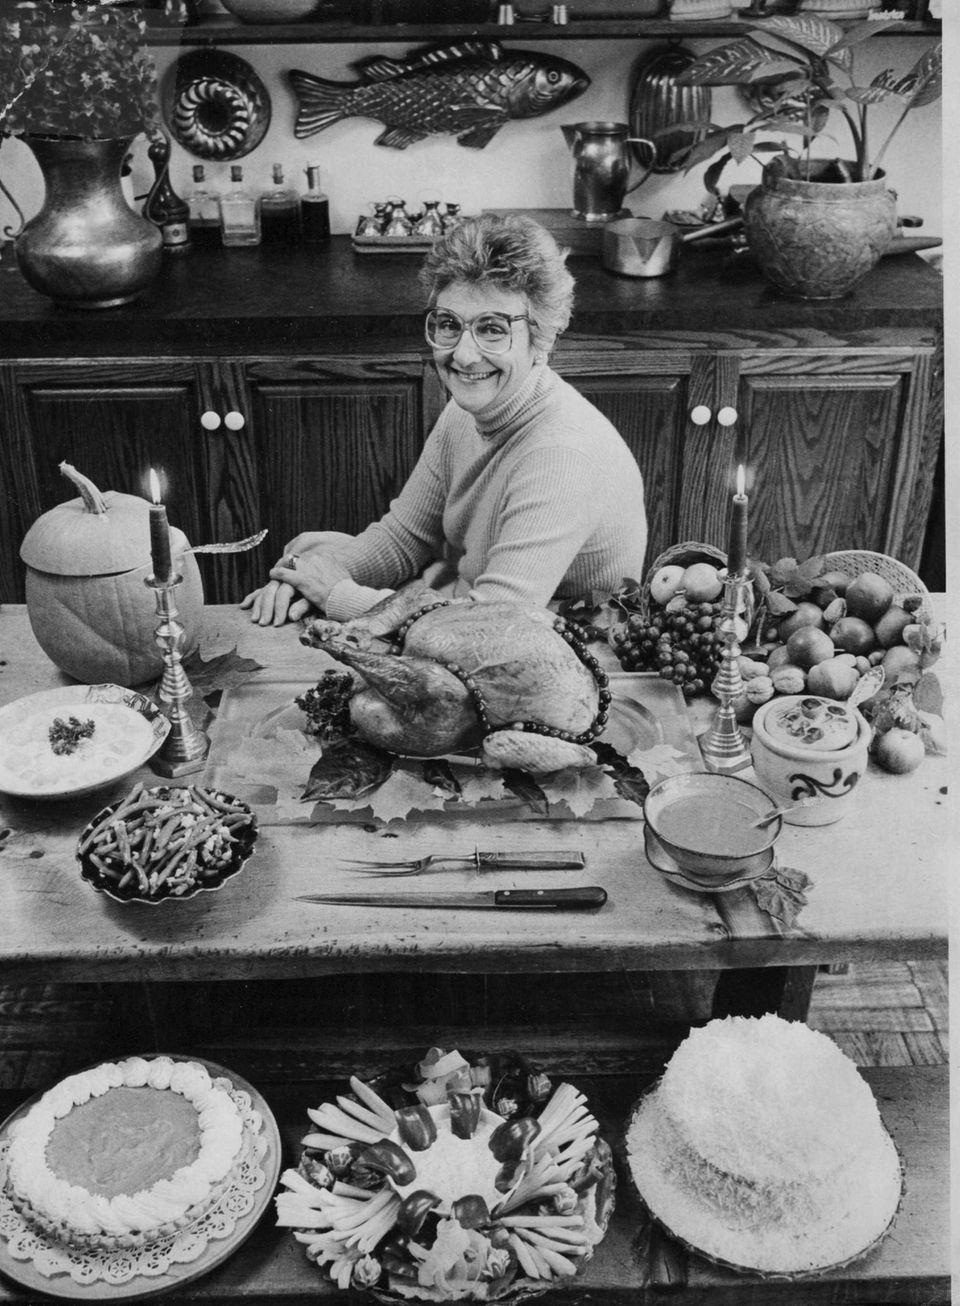 Cooking author and teacher Libby Hillman displays arrangement